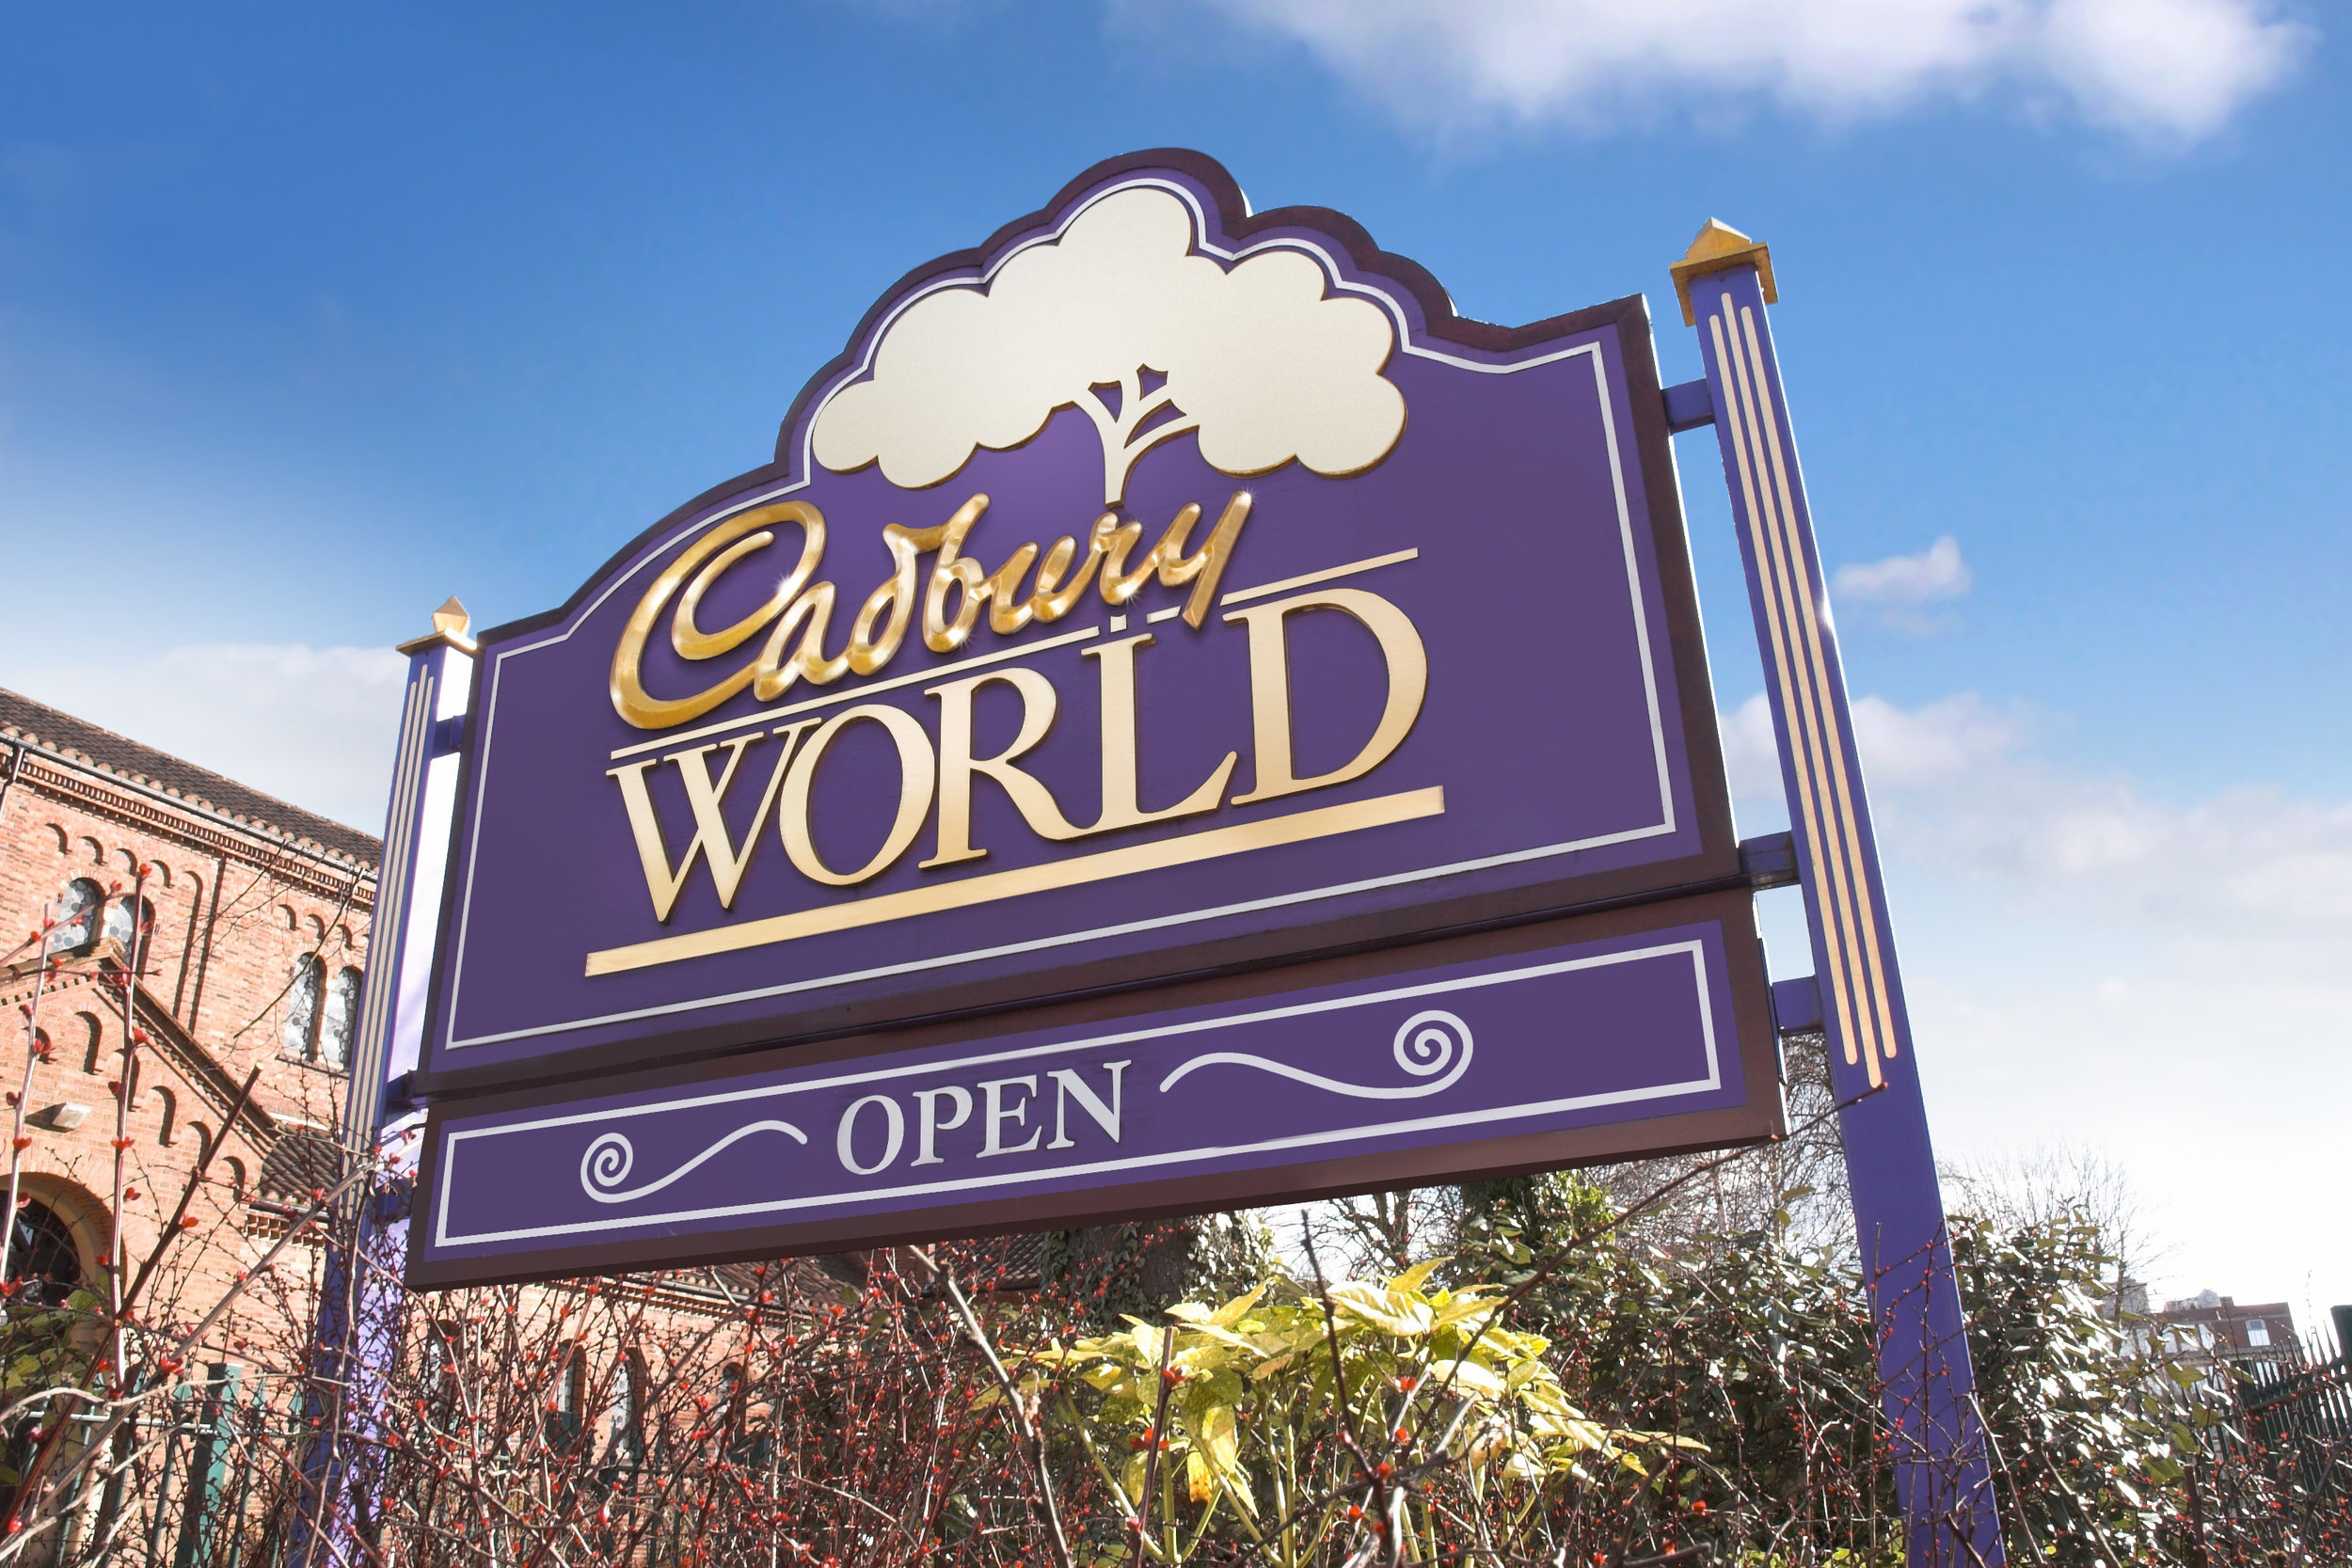 Cadbury World sign.jpg